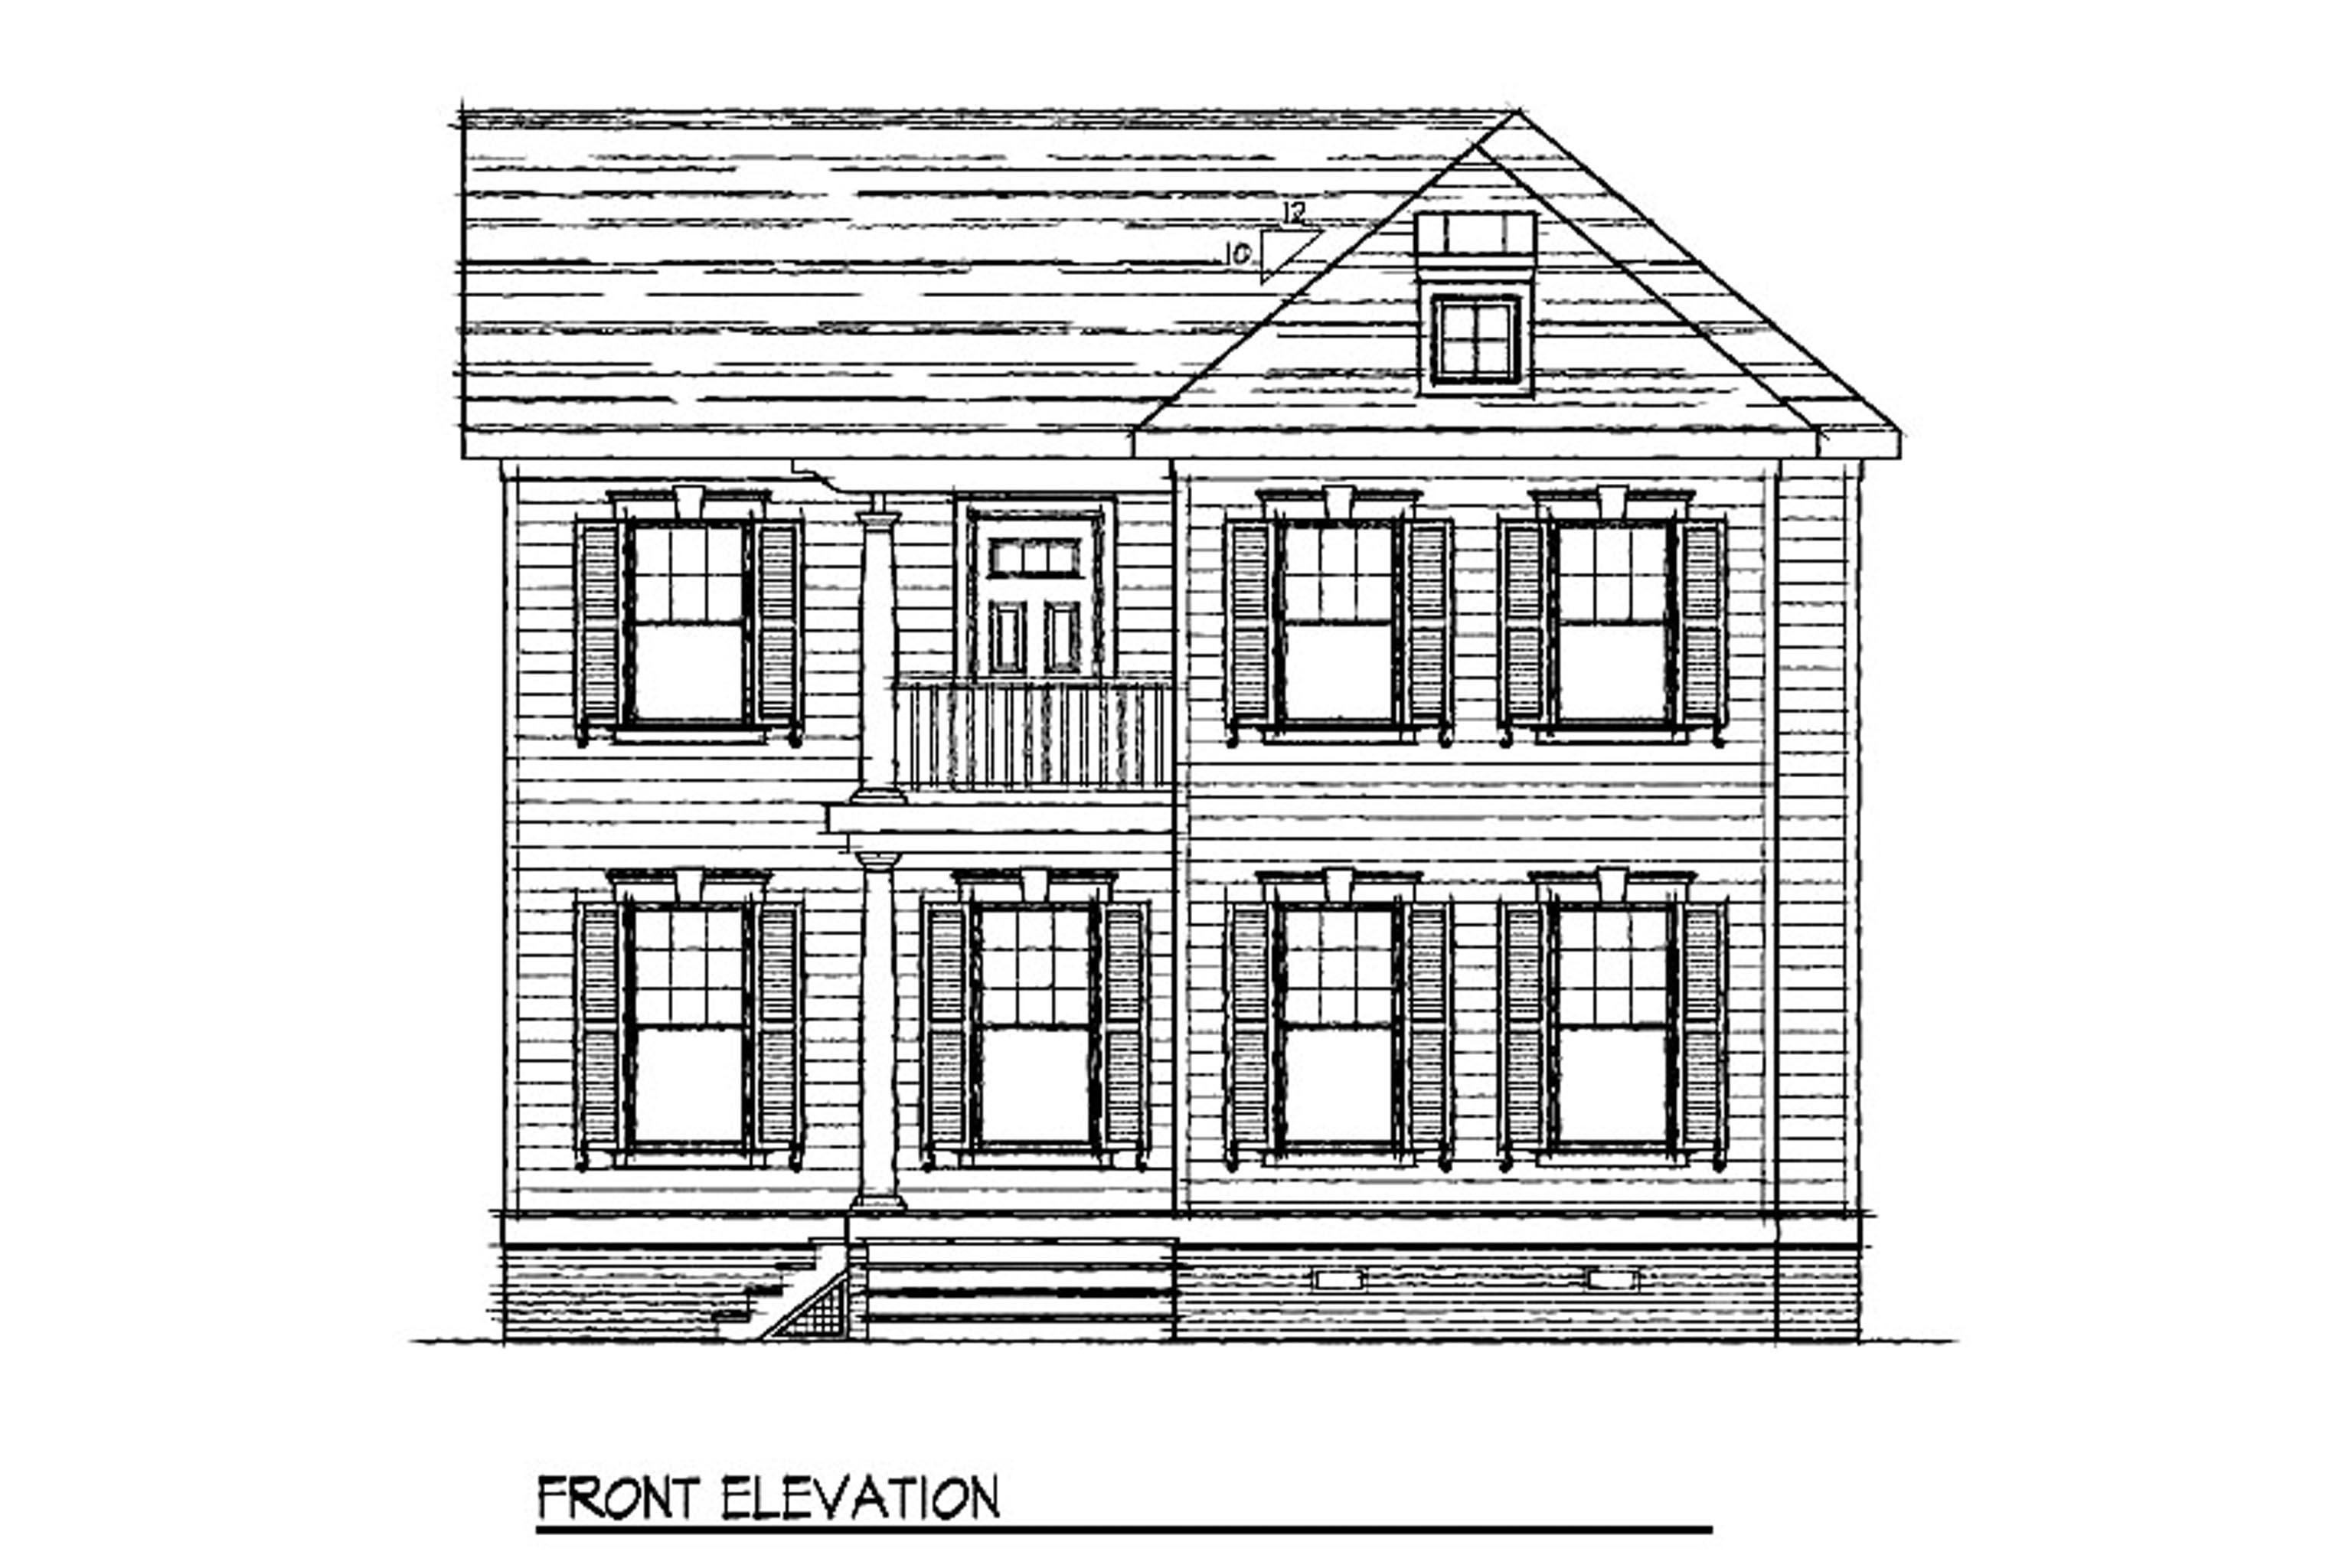 House Plan 116 - Melrose